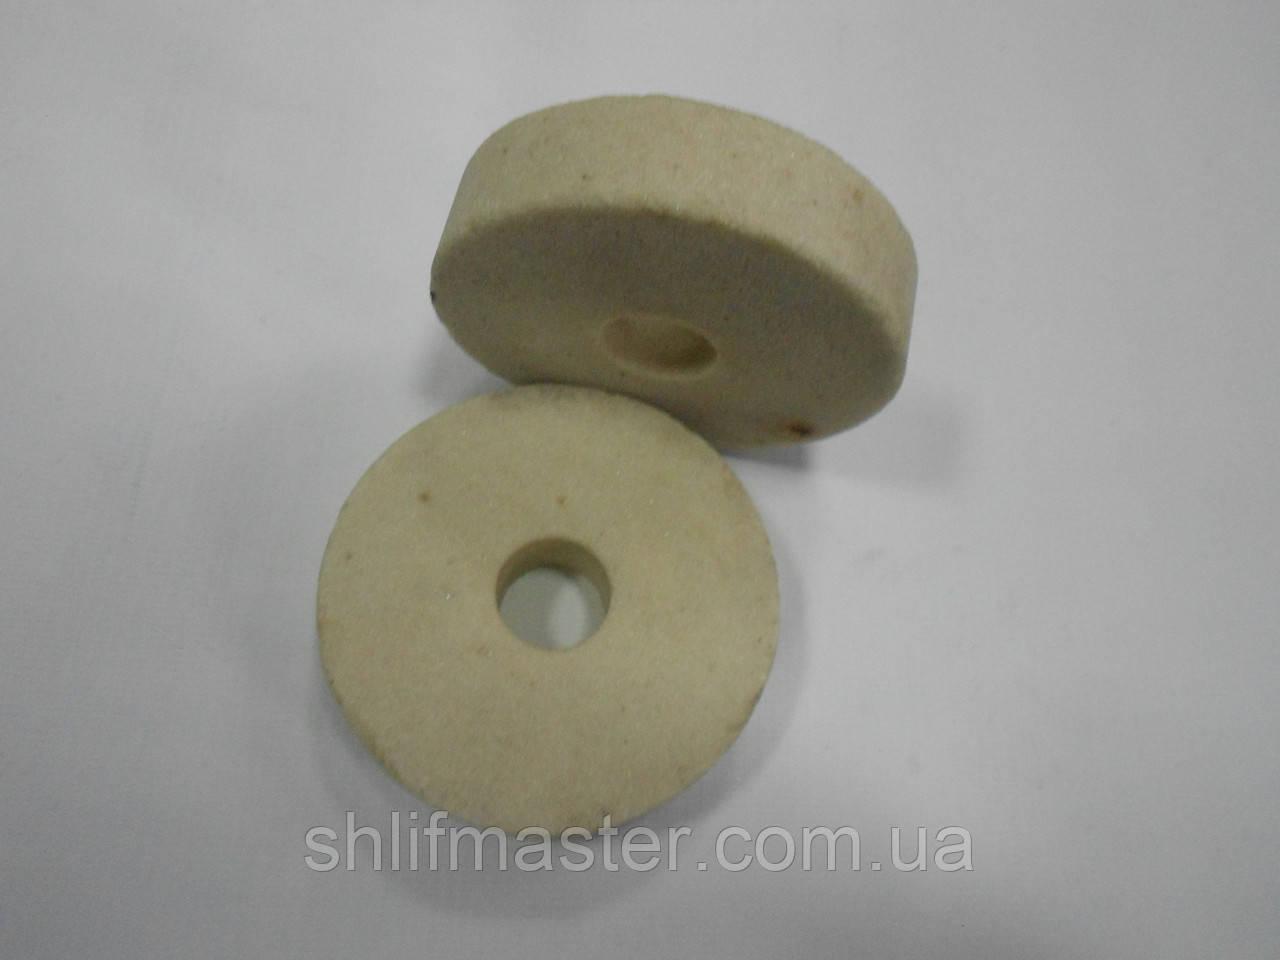 Абразивный круг шлифовальный (электрокорунд белый) 25А ПП 80Х10Х20 12 СМ, 25 СМ